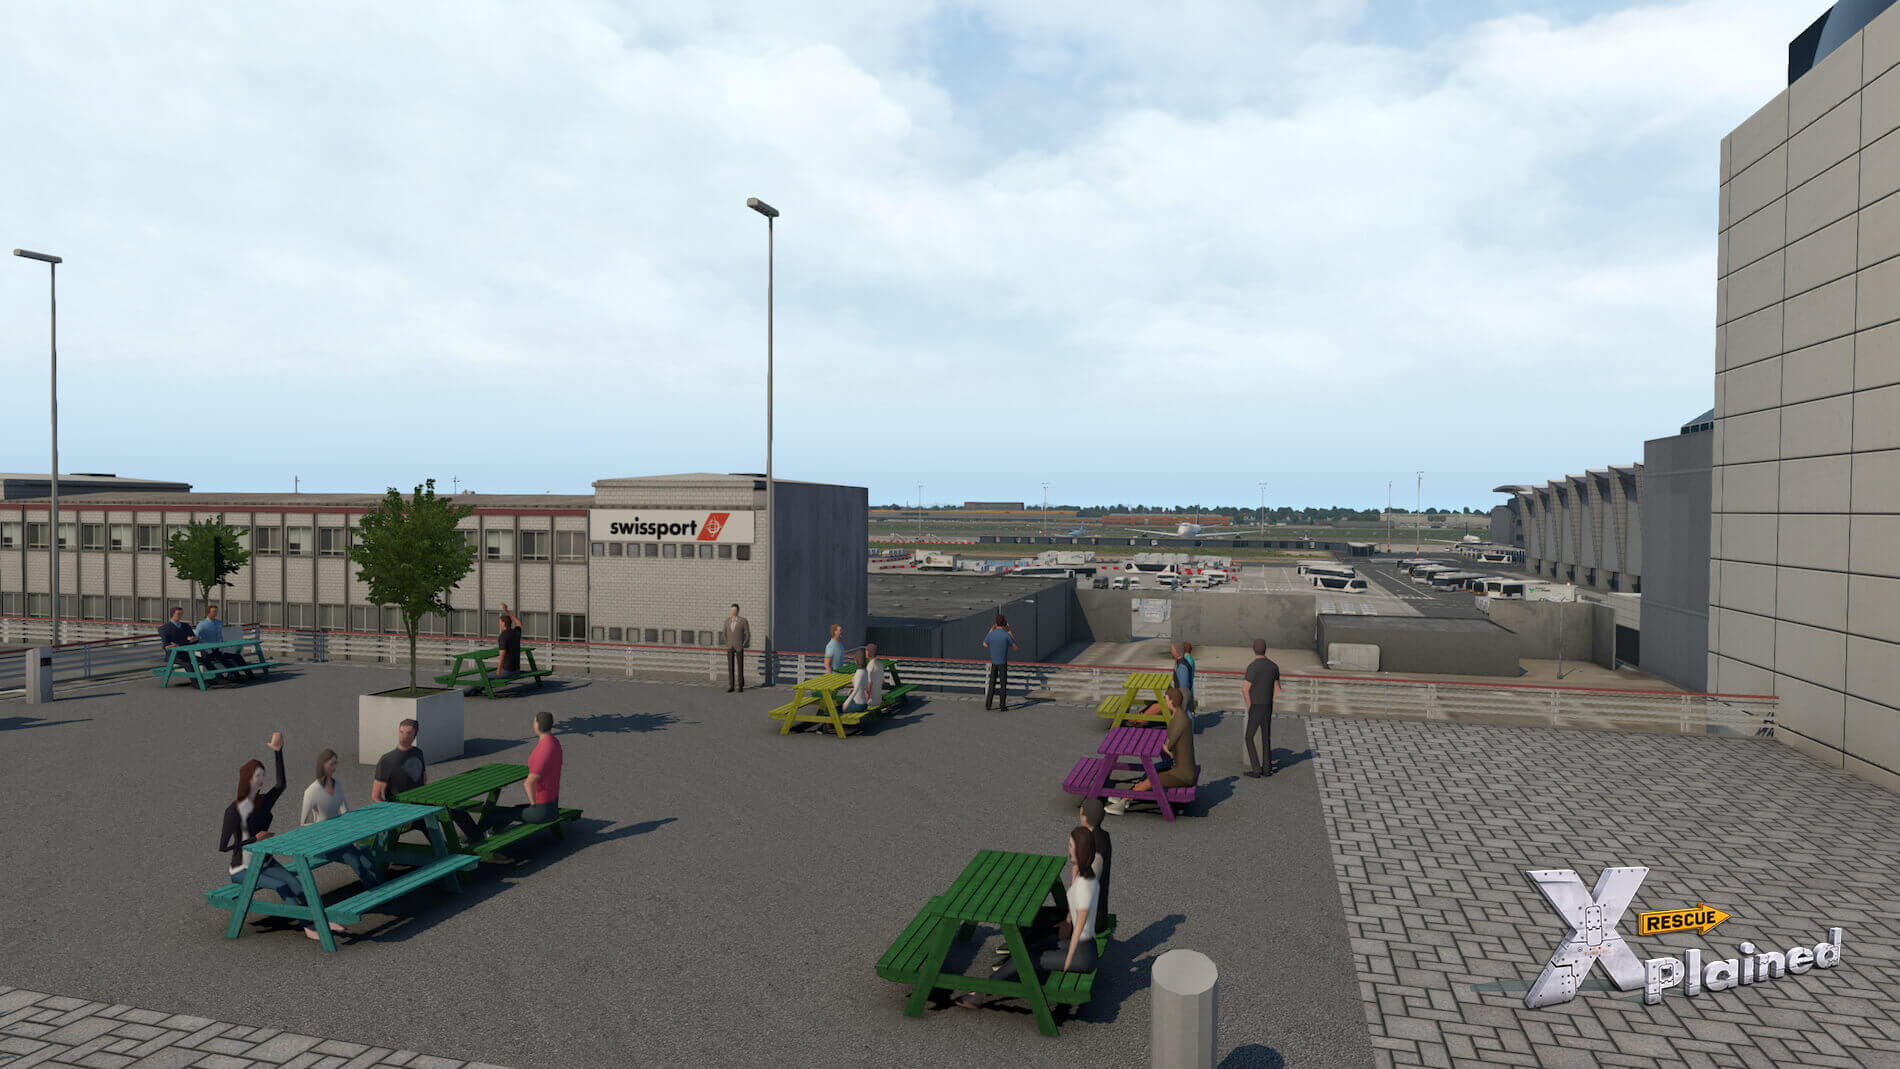 JustSim-EBBR-Airport-59